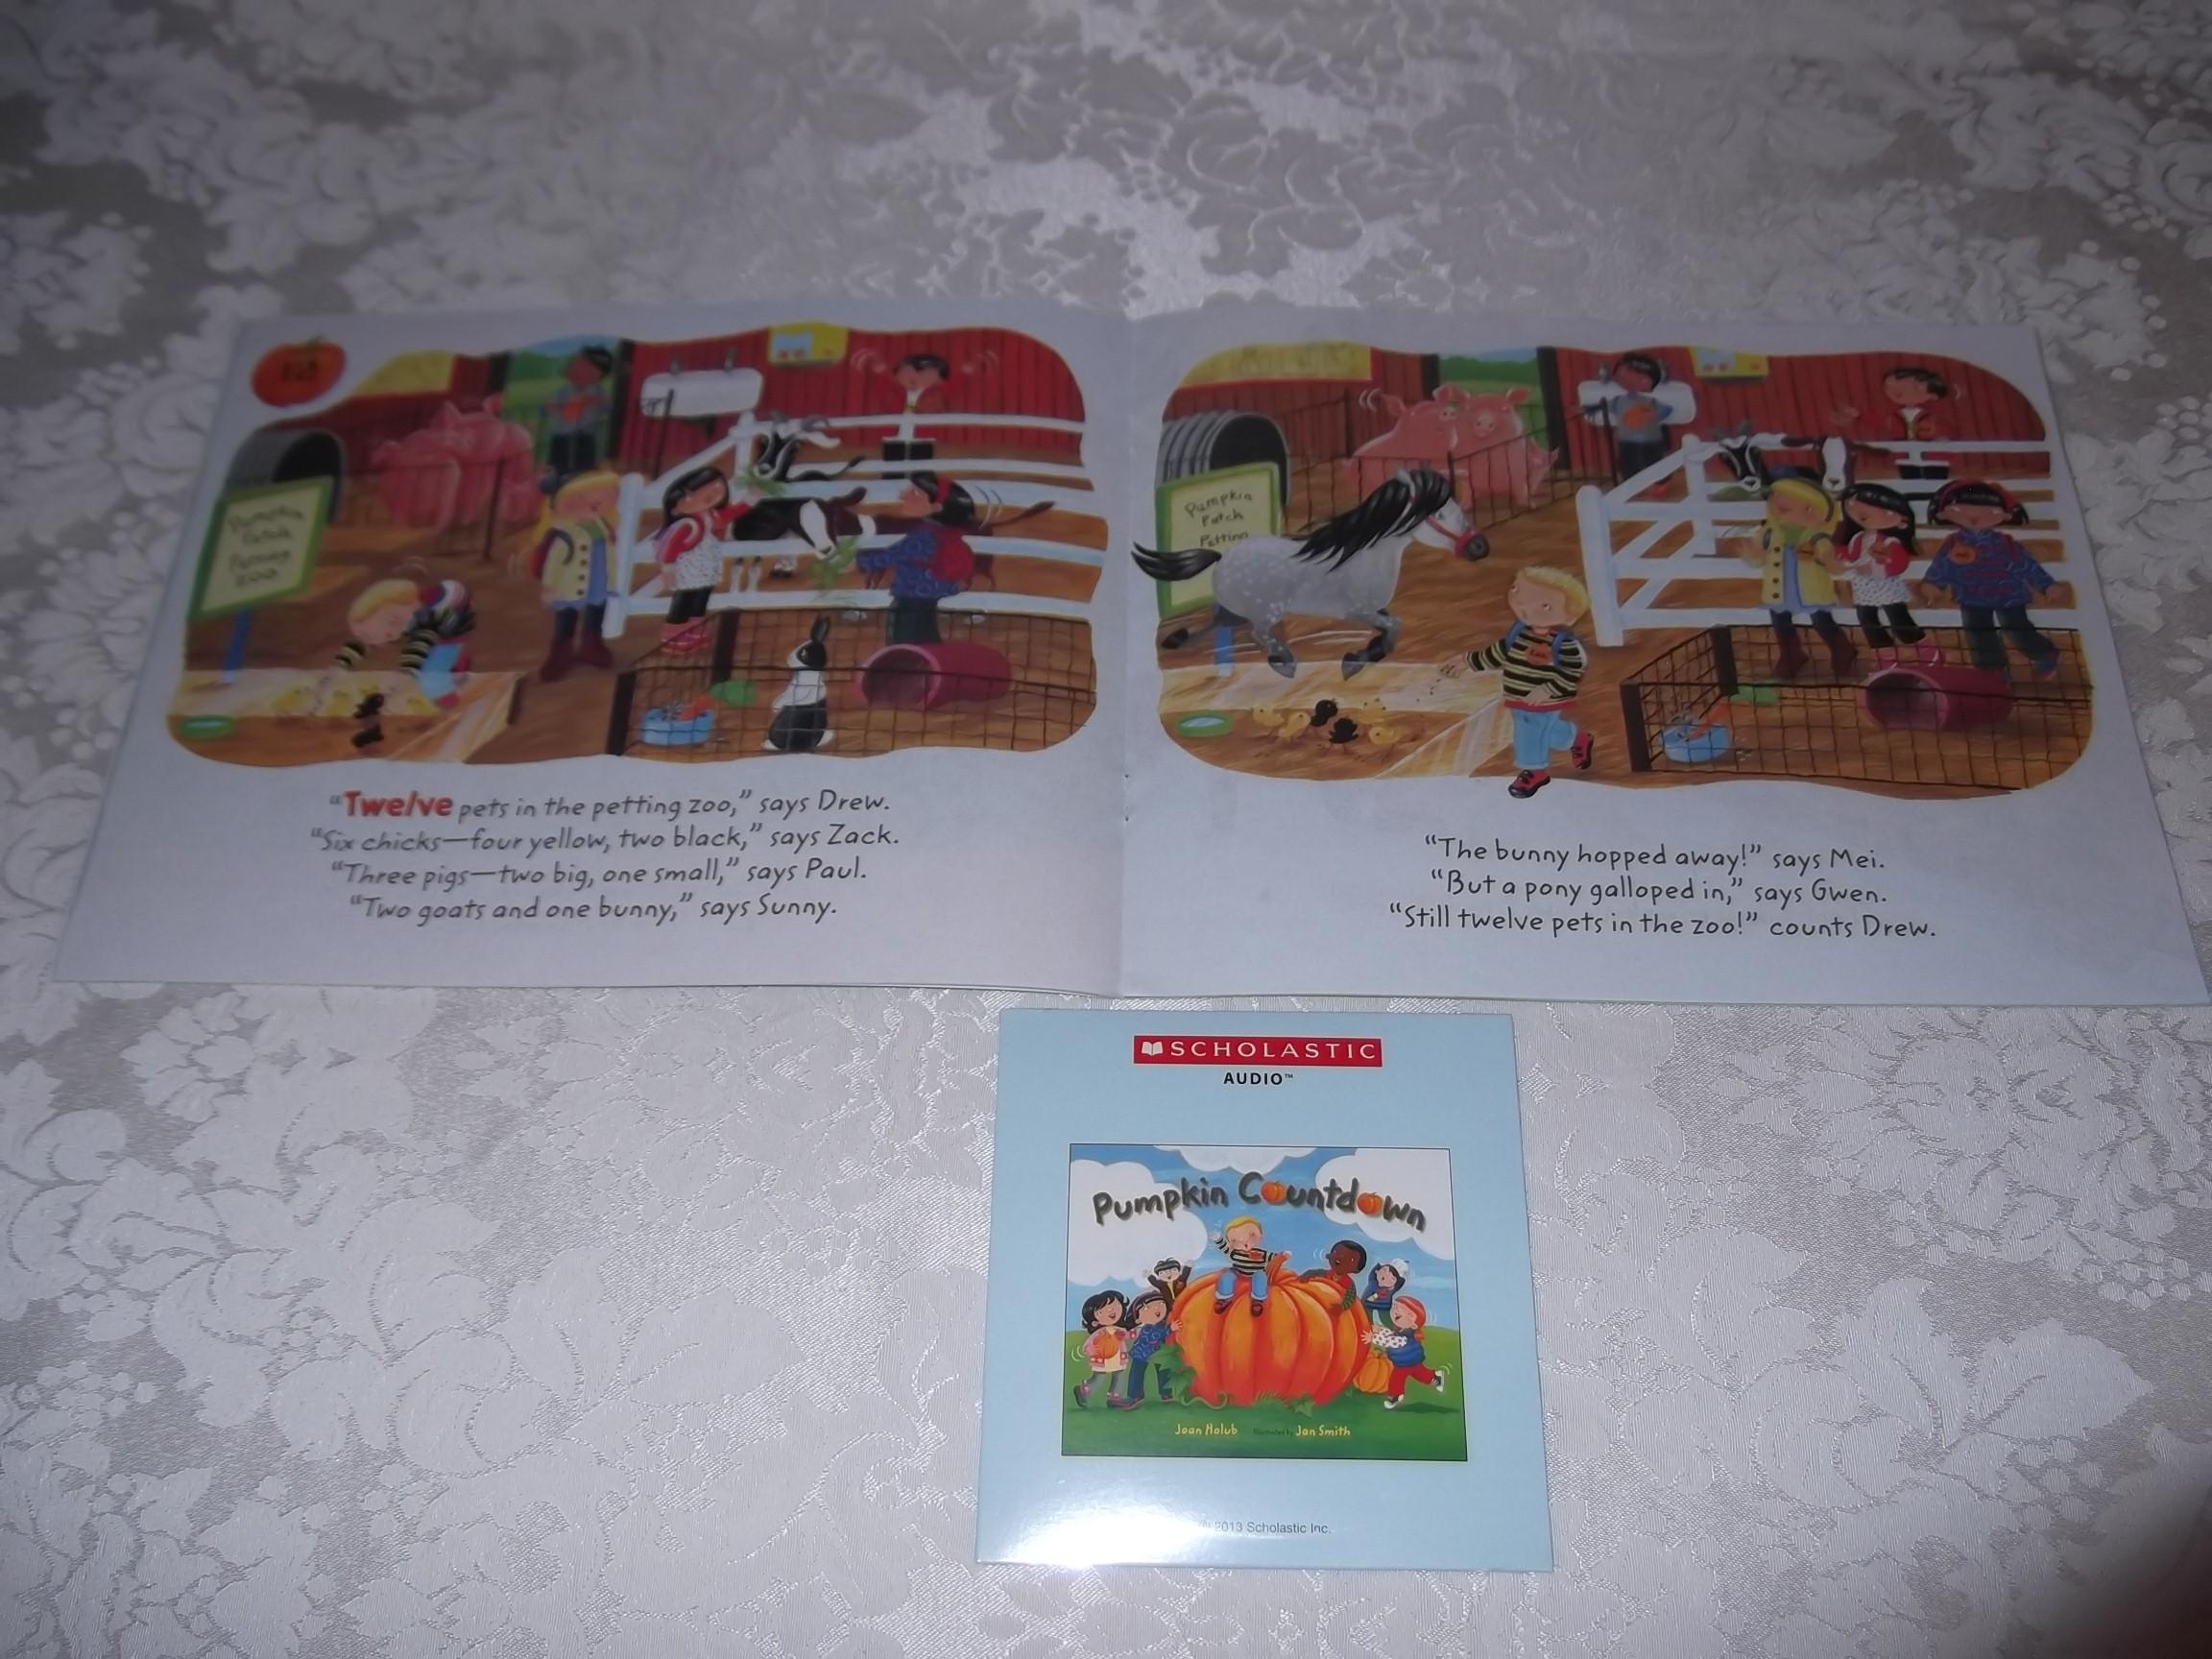 Image 4 of Pumpkin Countdown Joan Holub Audio CD & SC Set Brand New